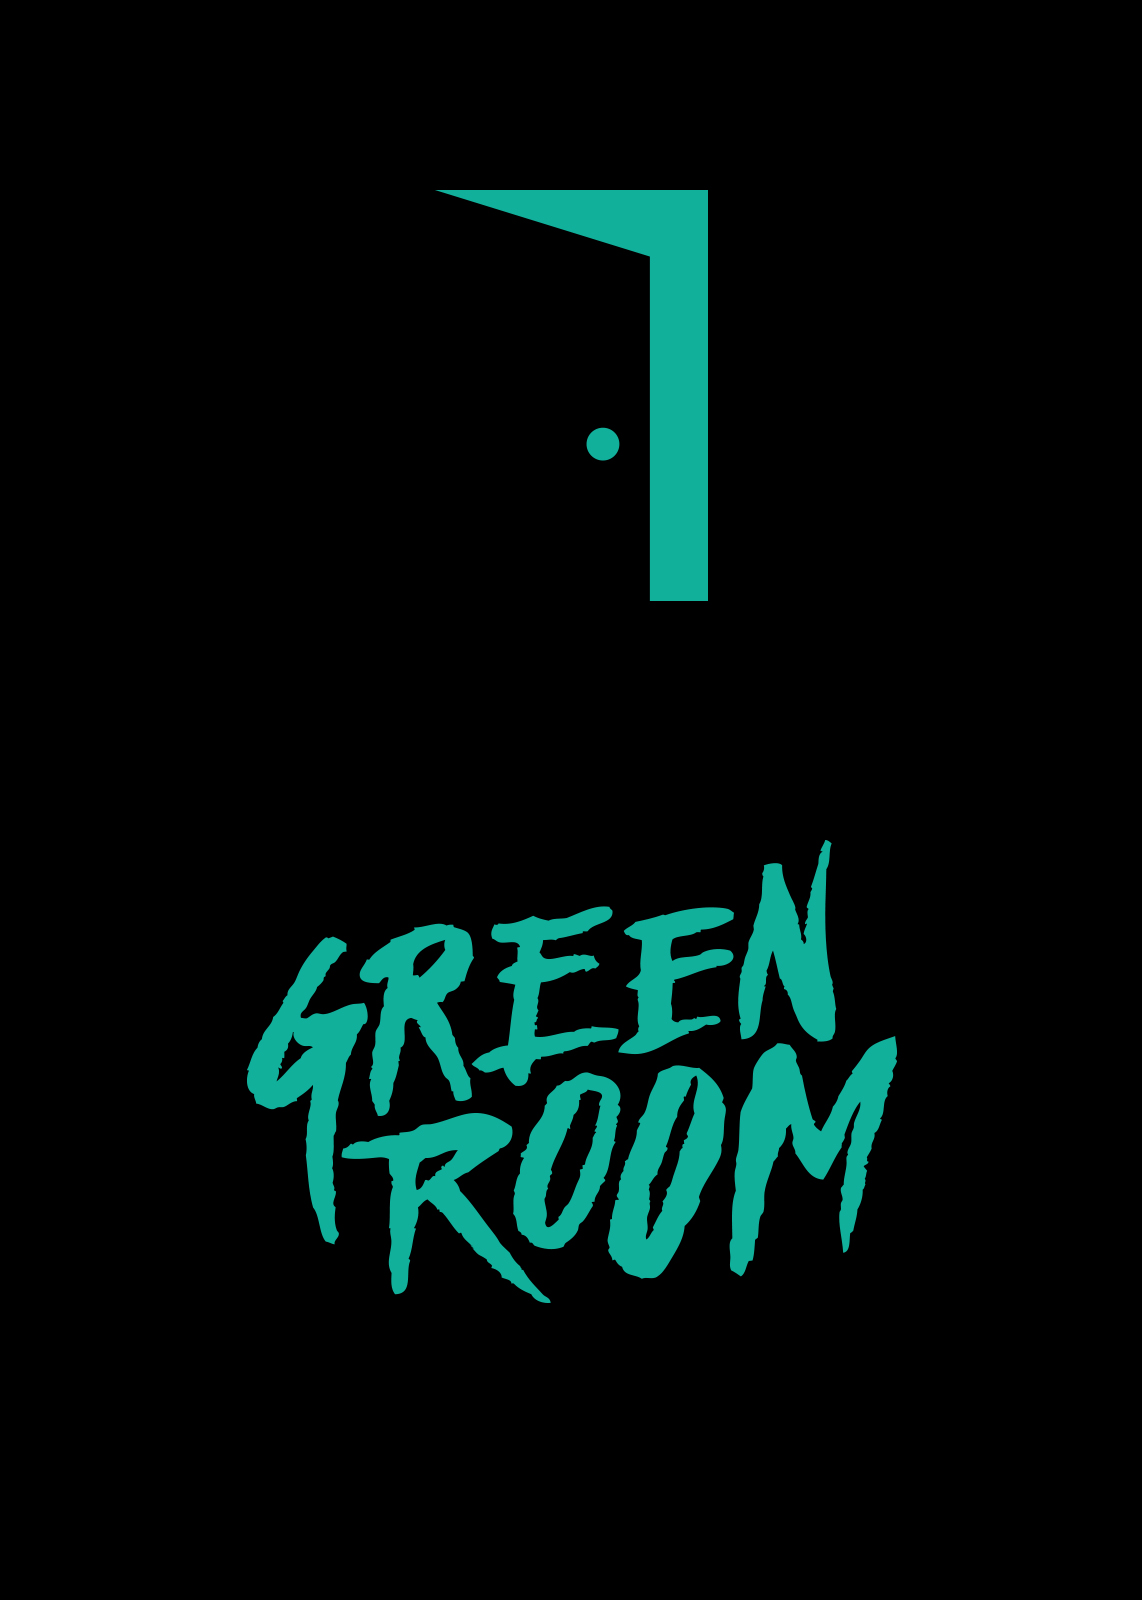 Green Room_Vertical7.jpg